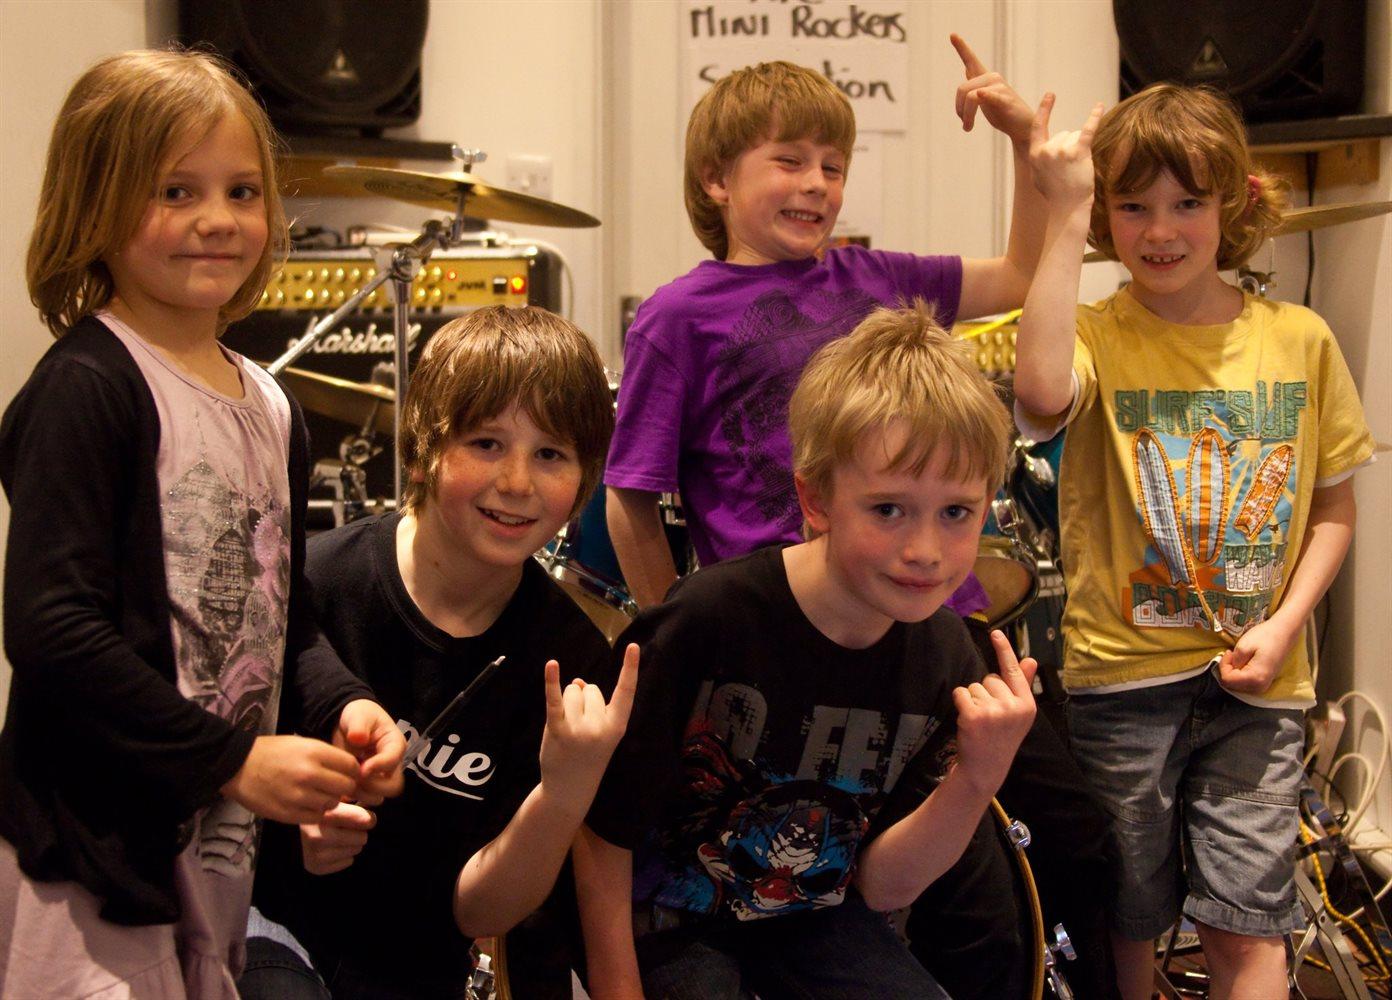 The Mini Band